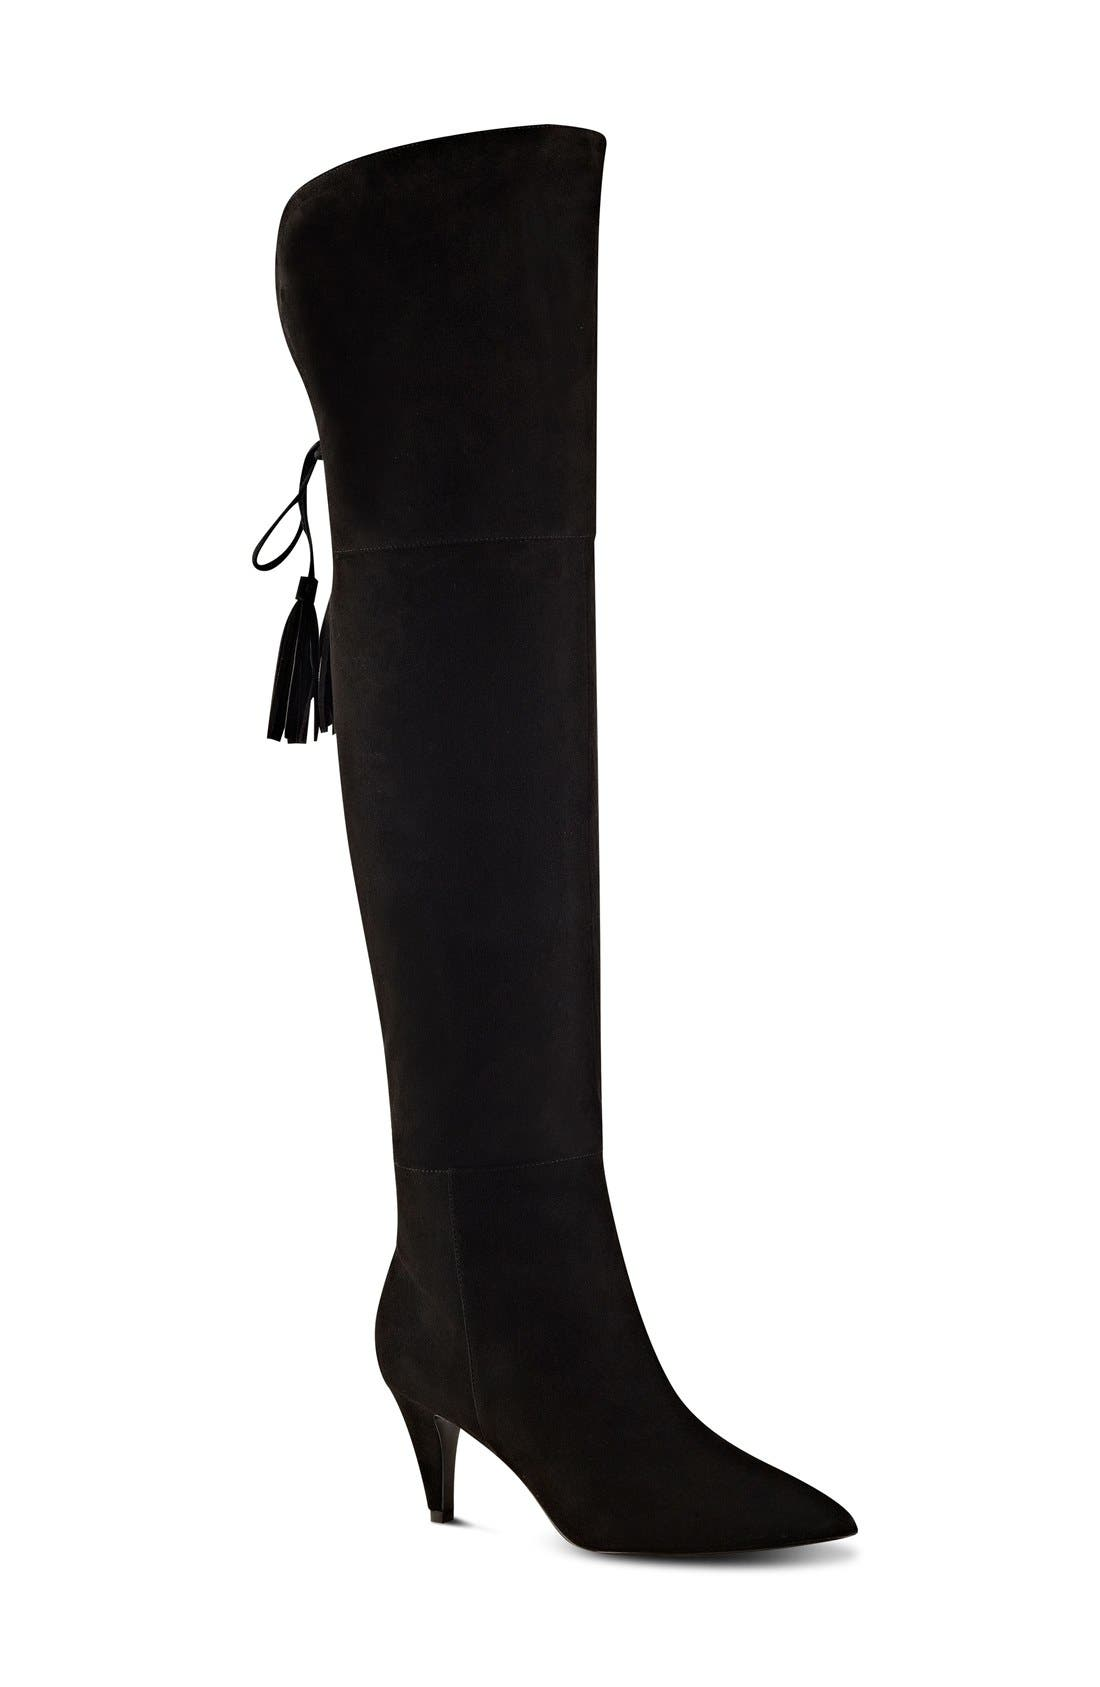 NINE WEST 'Josephine' Over the Knee Tassel Boot, Main, color, 001